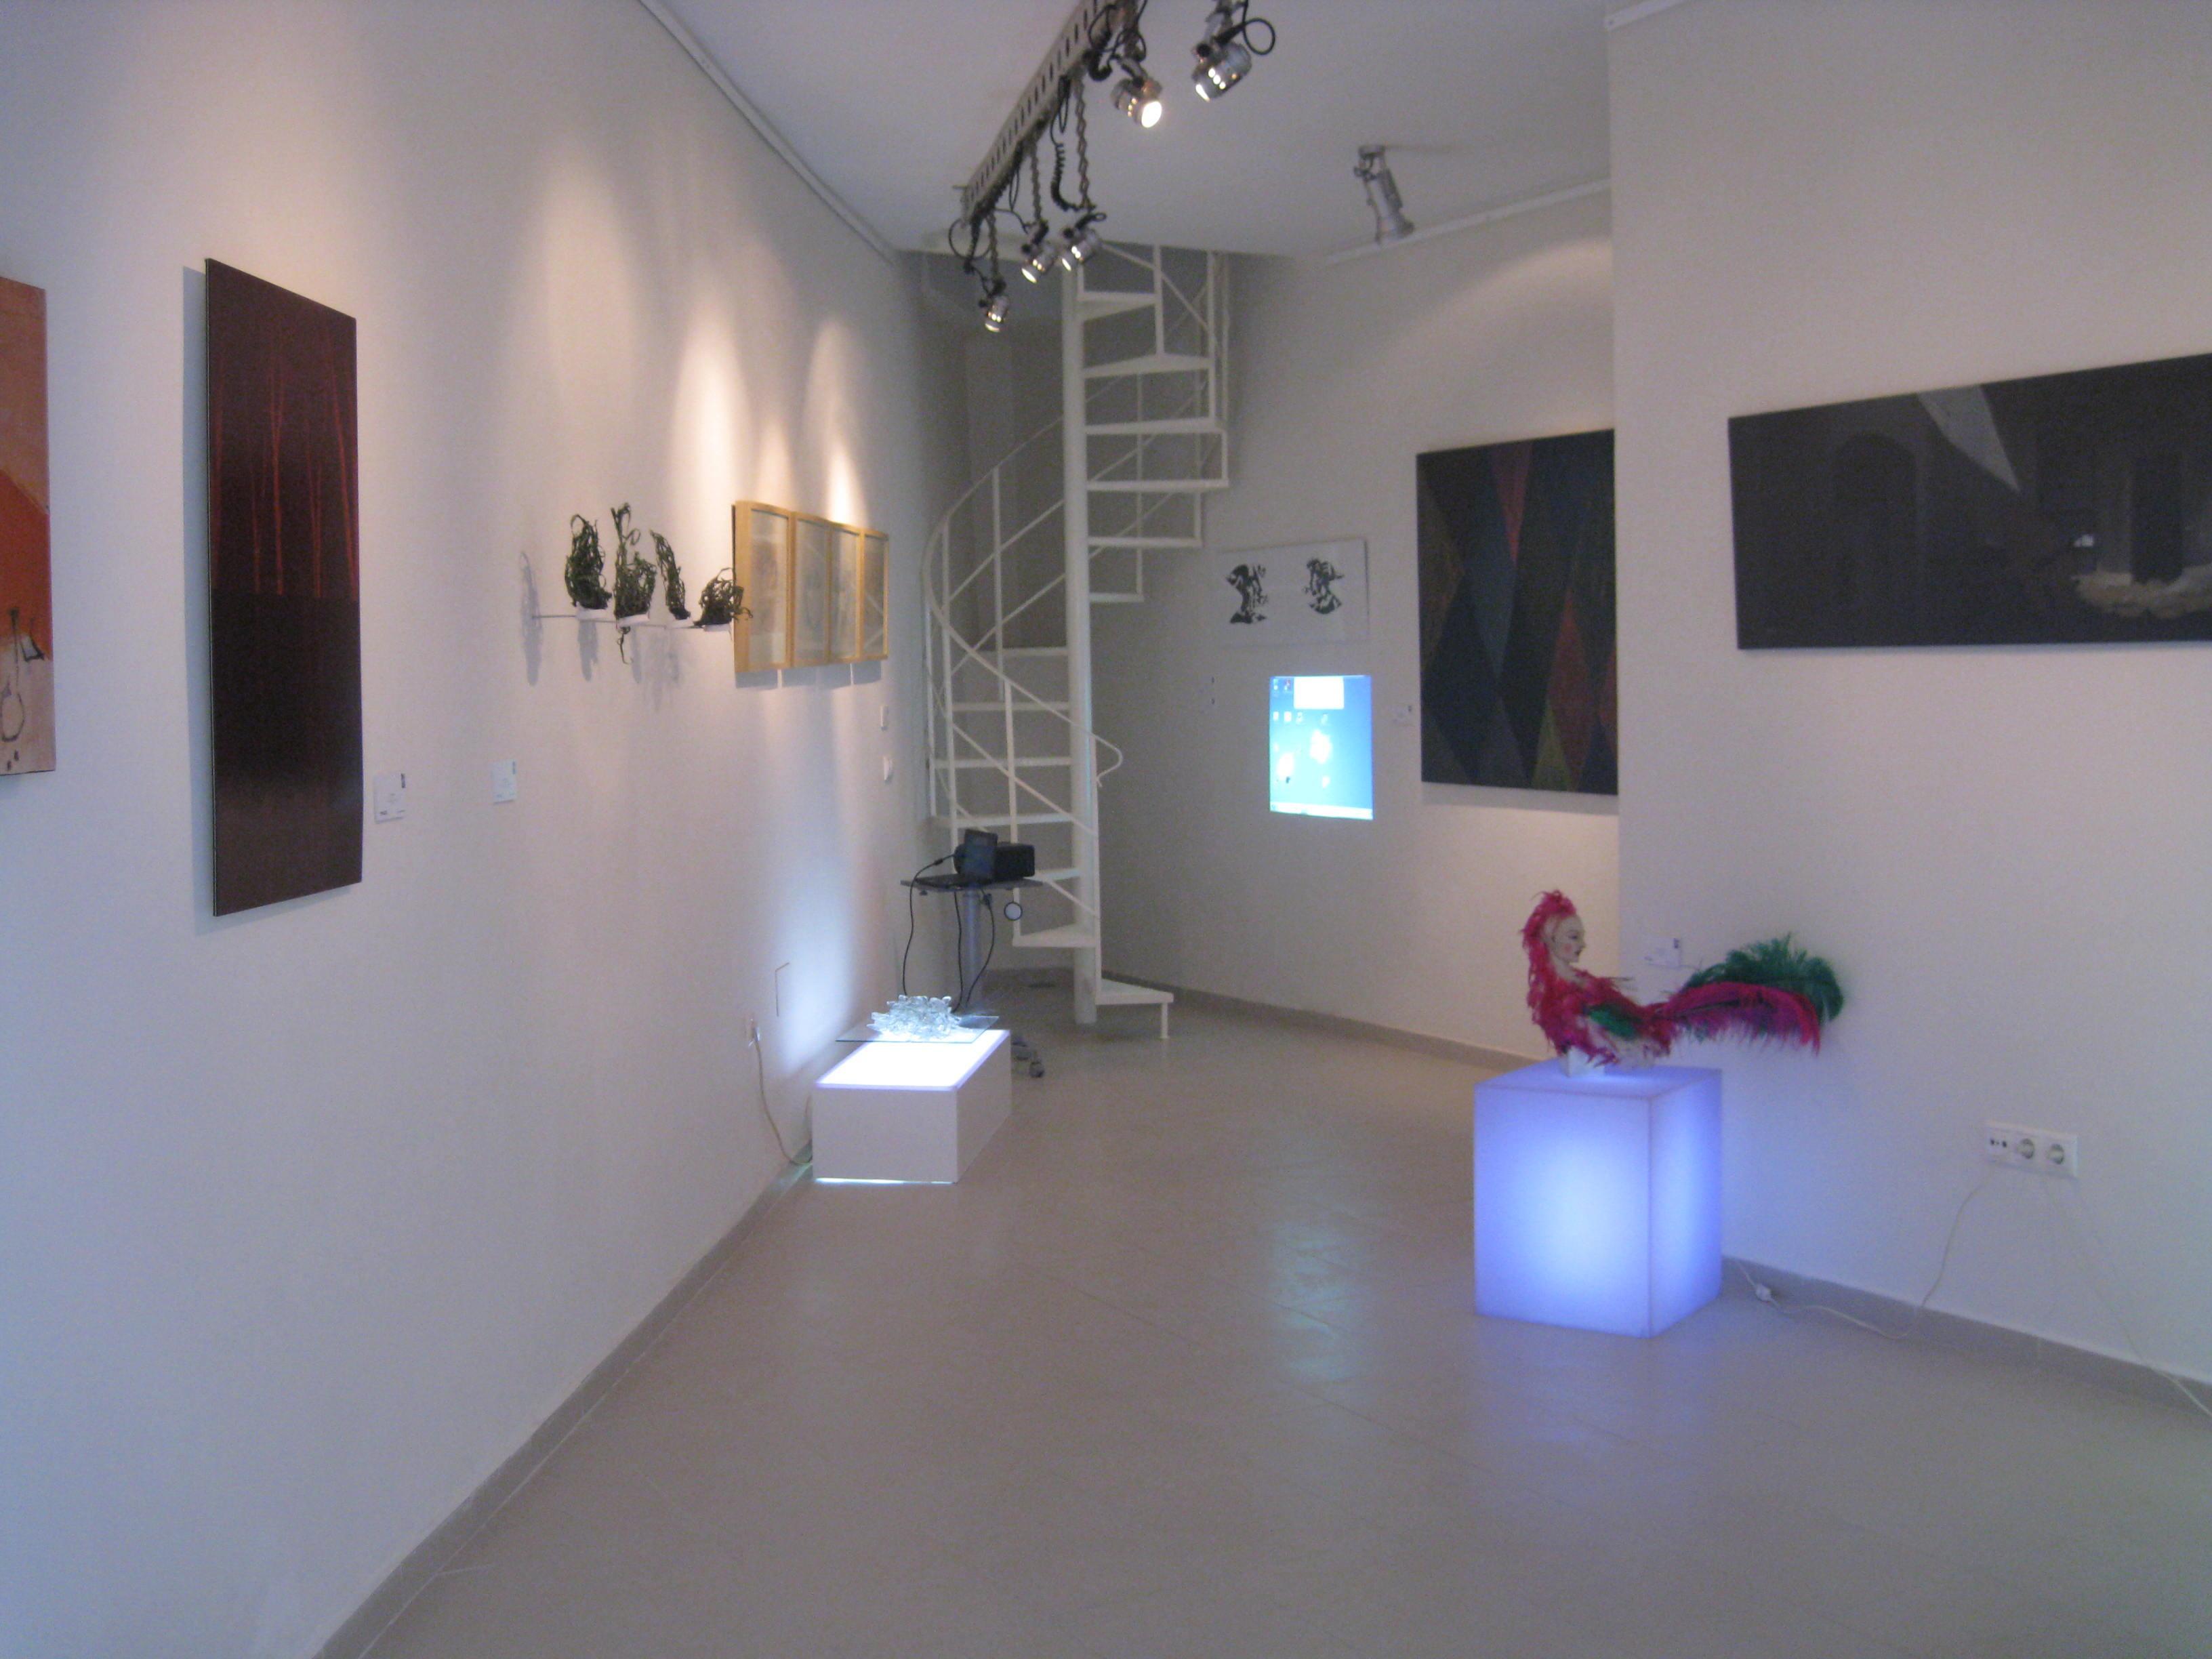 MECA Mediterráneo Centro Artístico